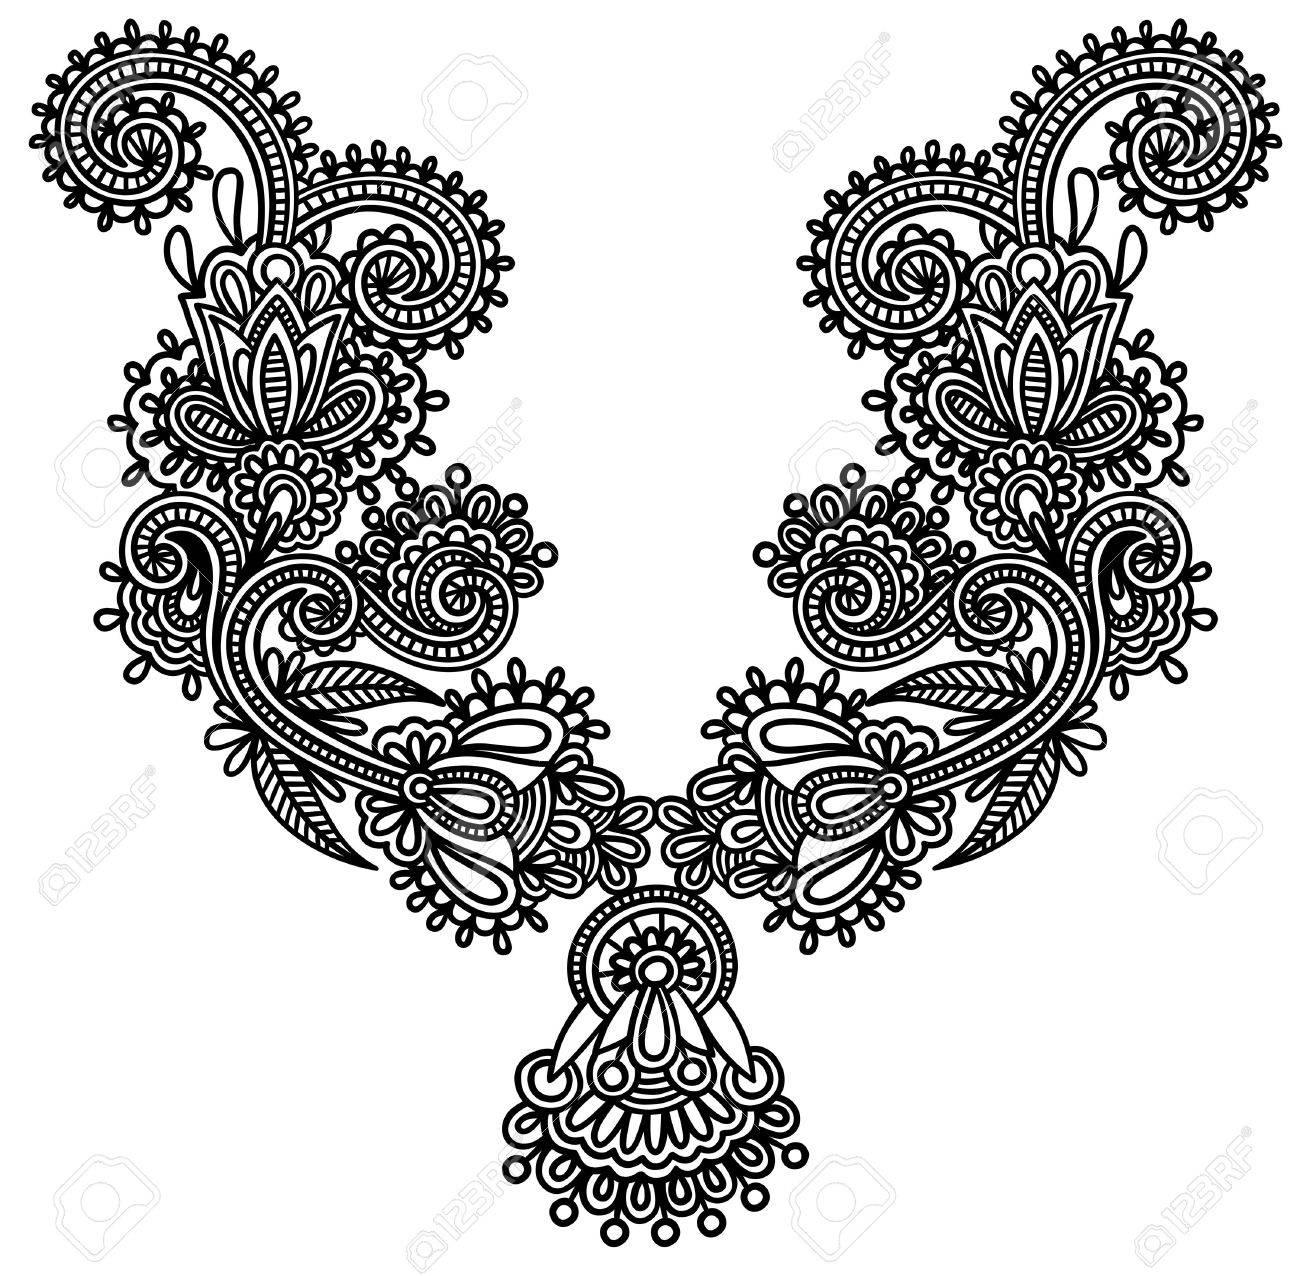 Neckline embroidery fashion Stock Vector - 11189212